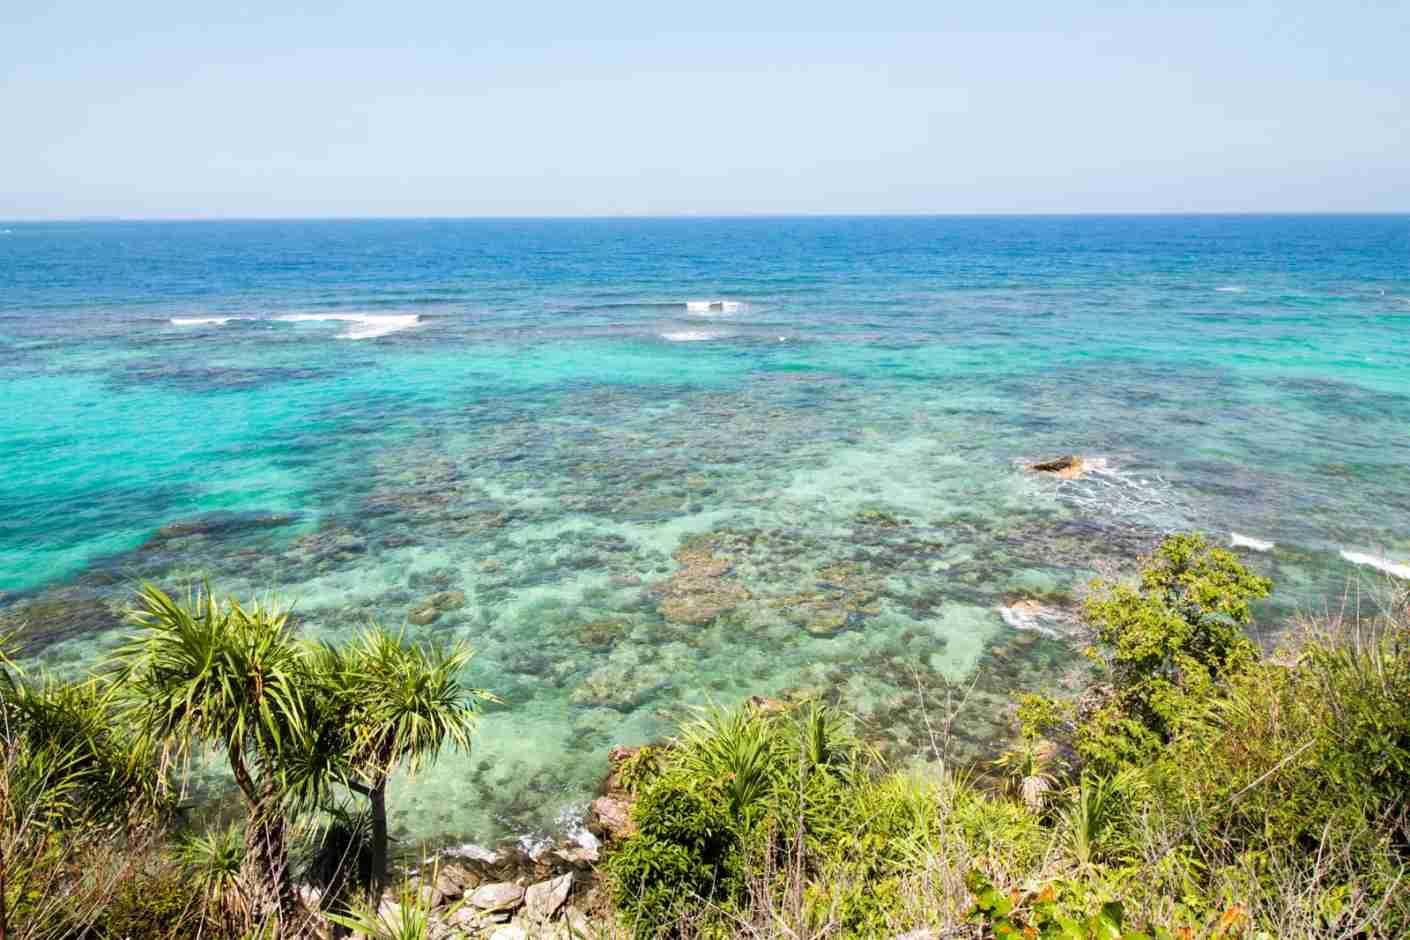 Karimunjawa Island. (Photo via Shutterstock)